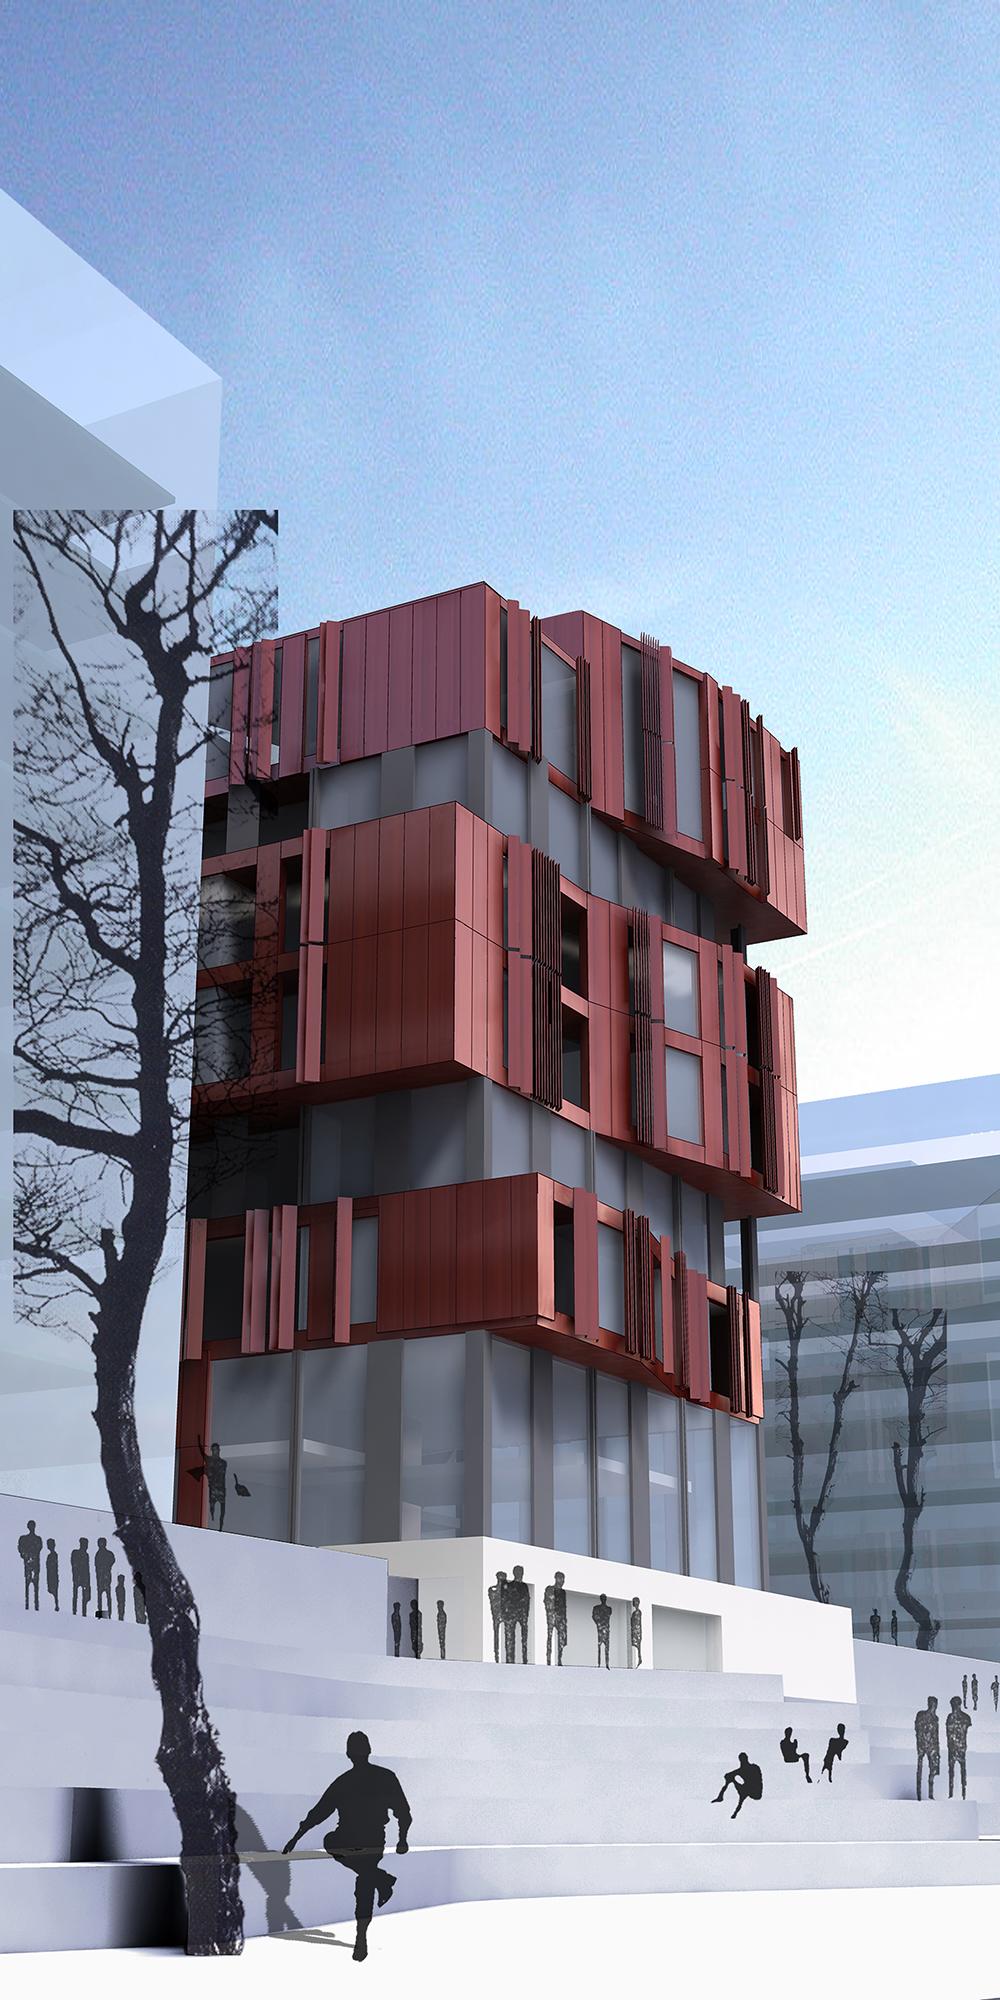 sml architekten hafencity baufeld 21 hamburg homebase2. Black Bedroom Furniture Sets. Home Design Ideas